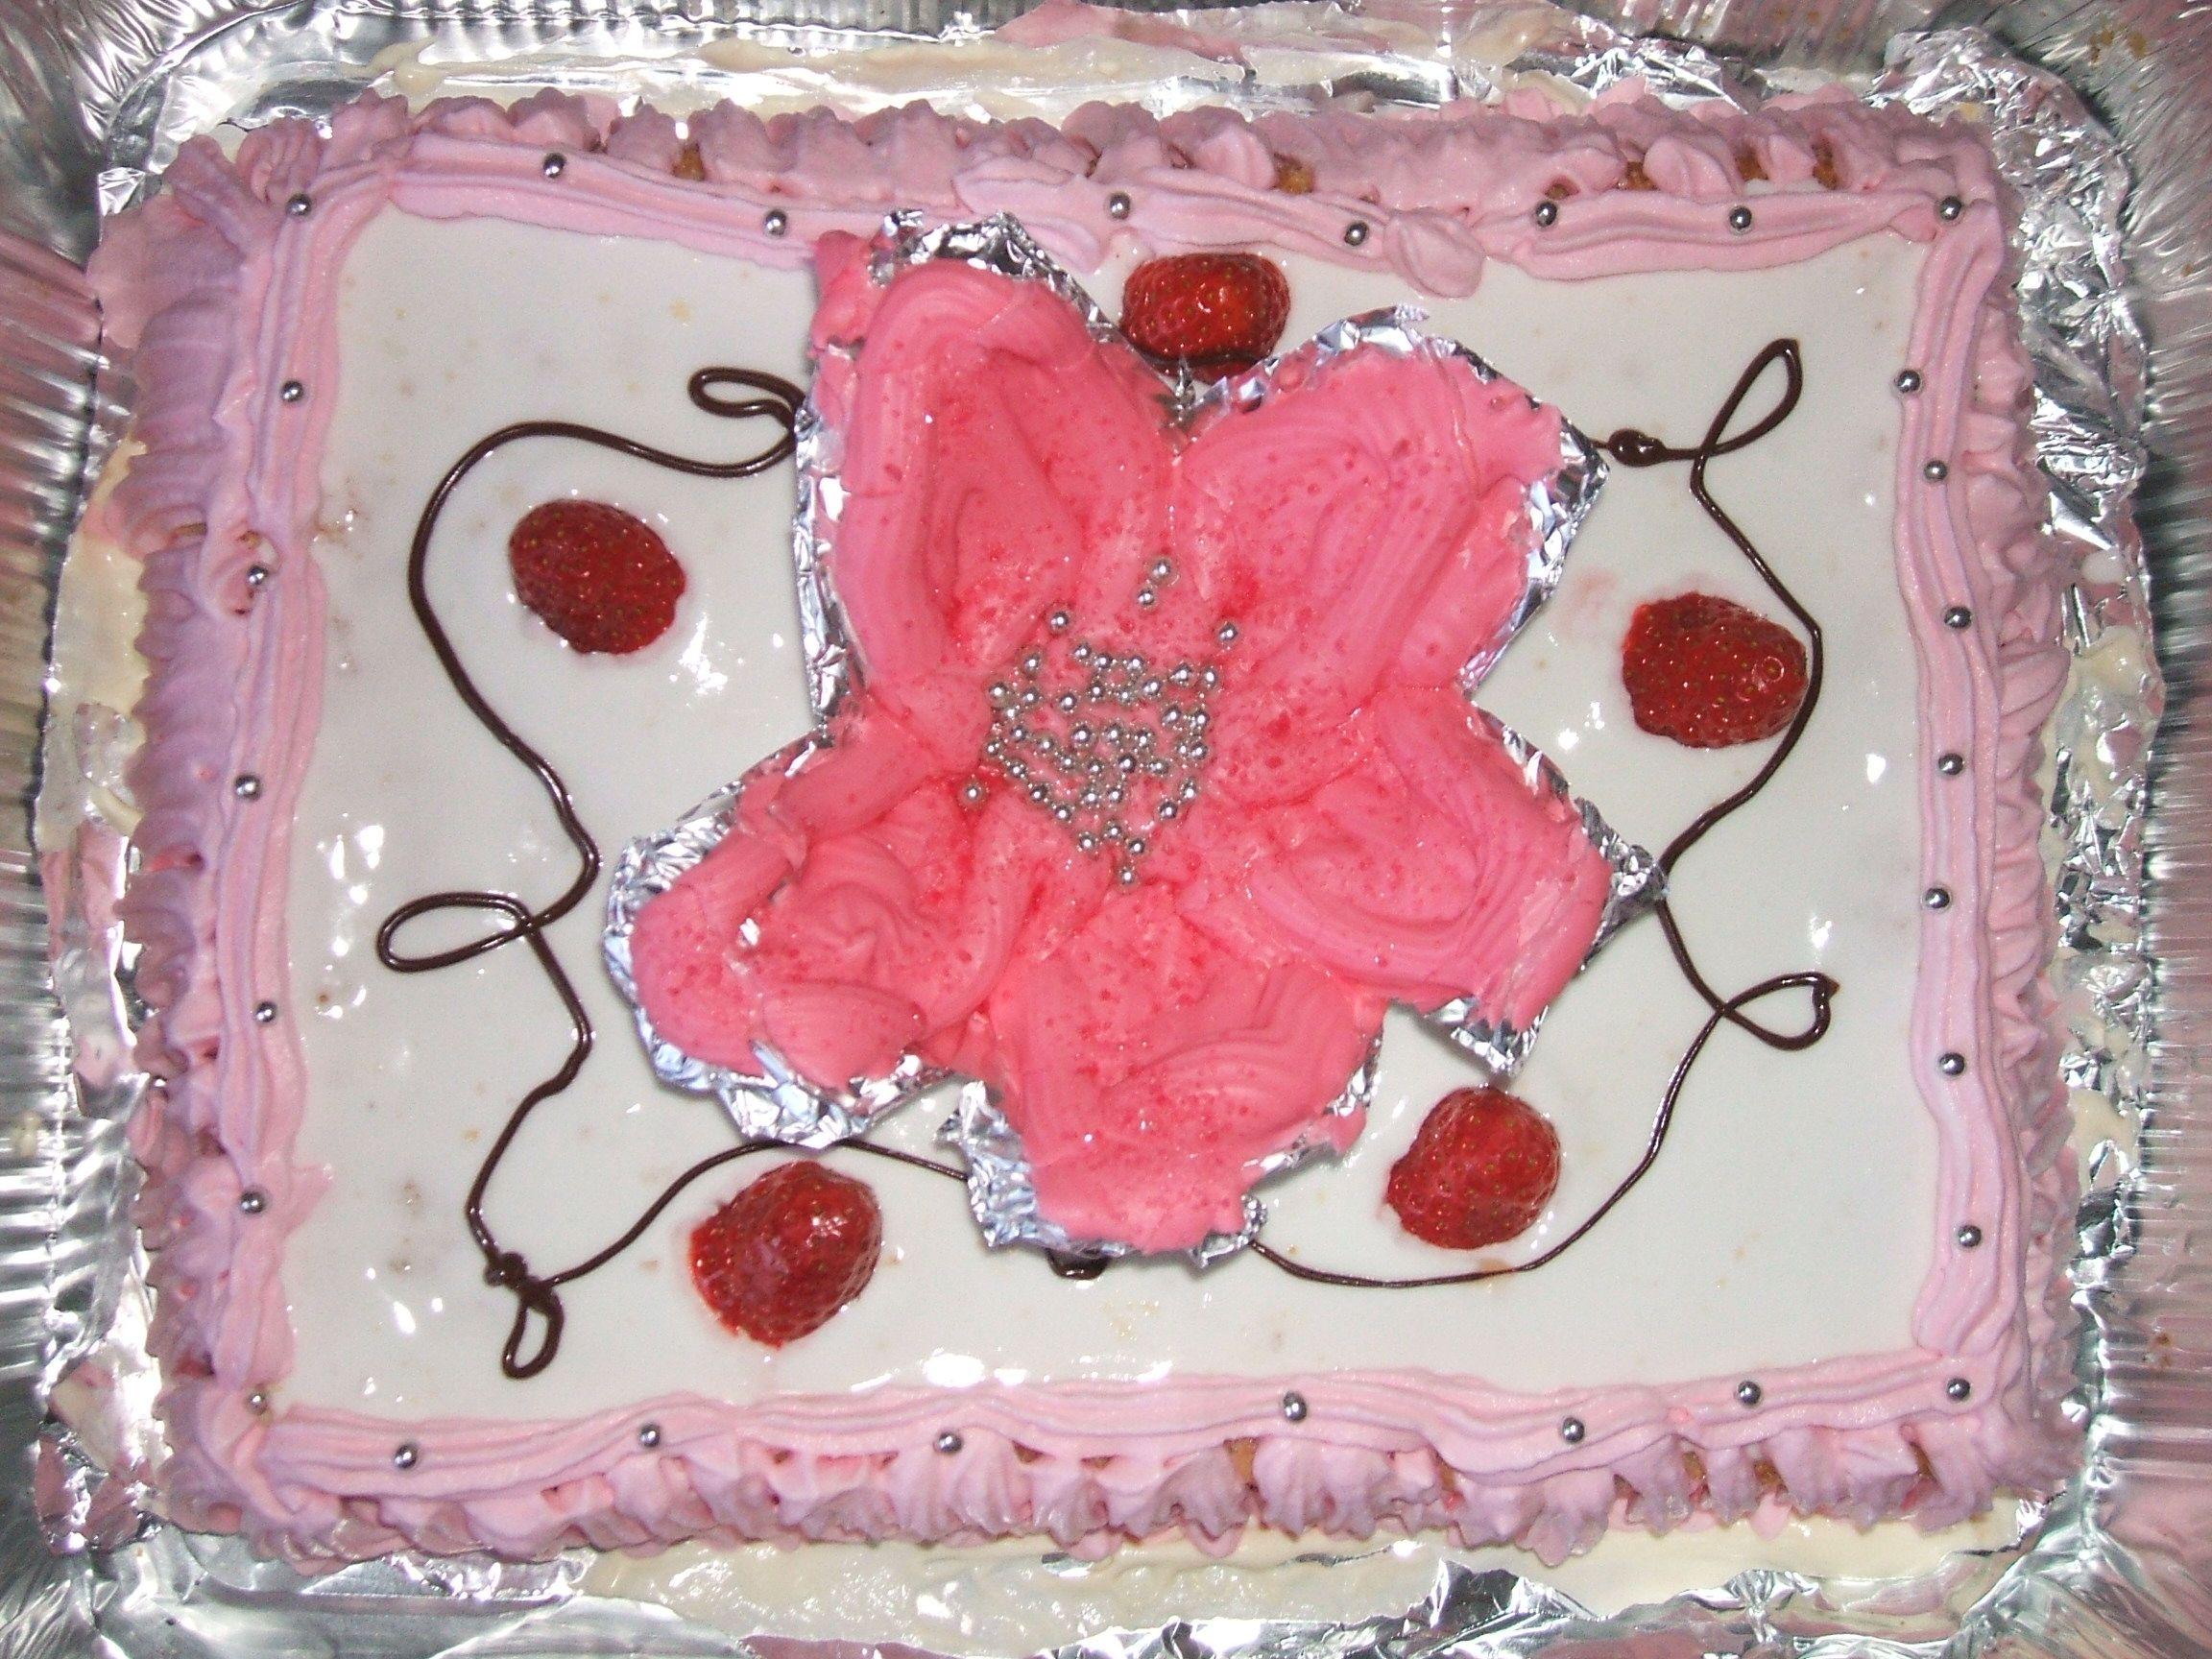 Granny's 70th birthday's cake!